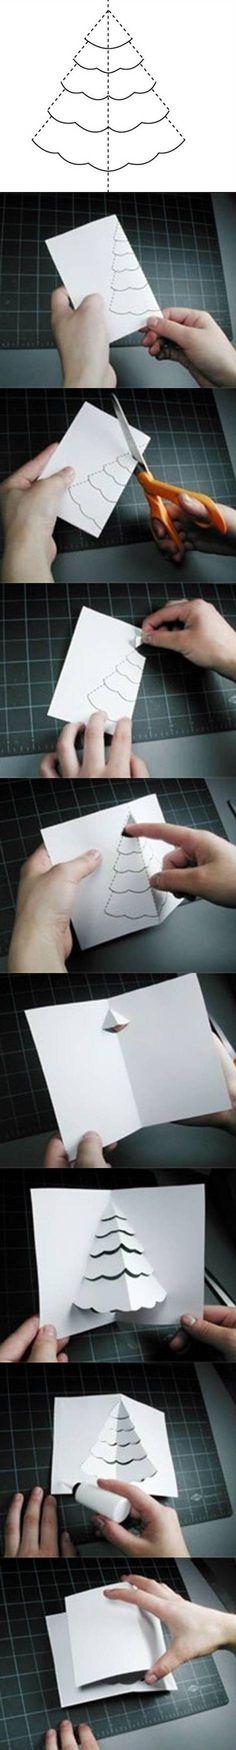 3D kerstboomkerstkaart - stappenplan